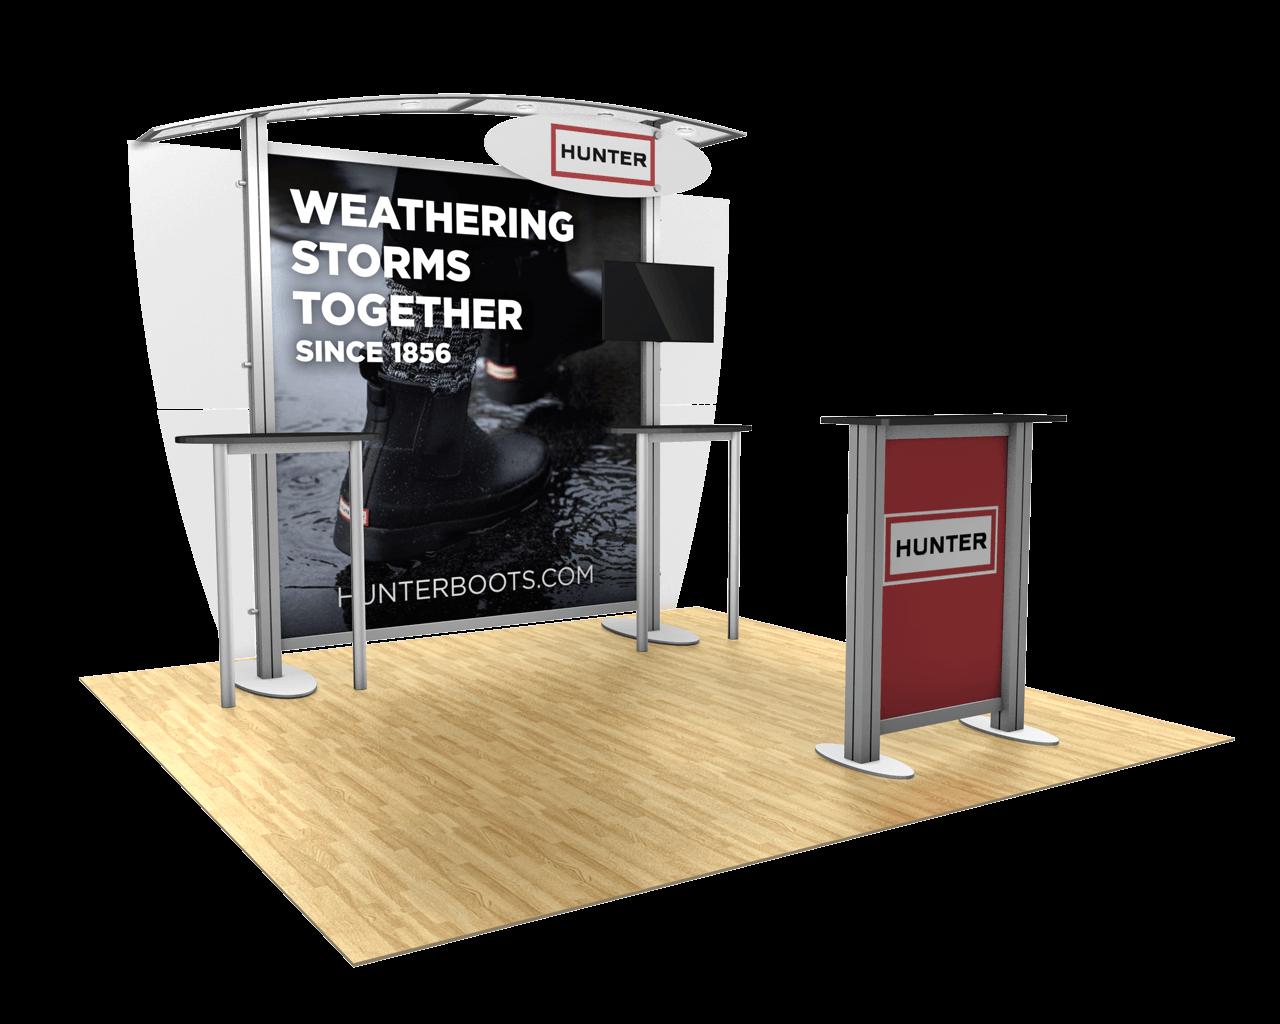 XVline Modular 10ft Trade Show Display Kit - 10.04